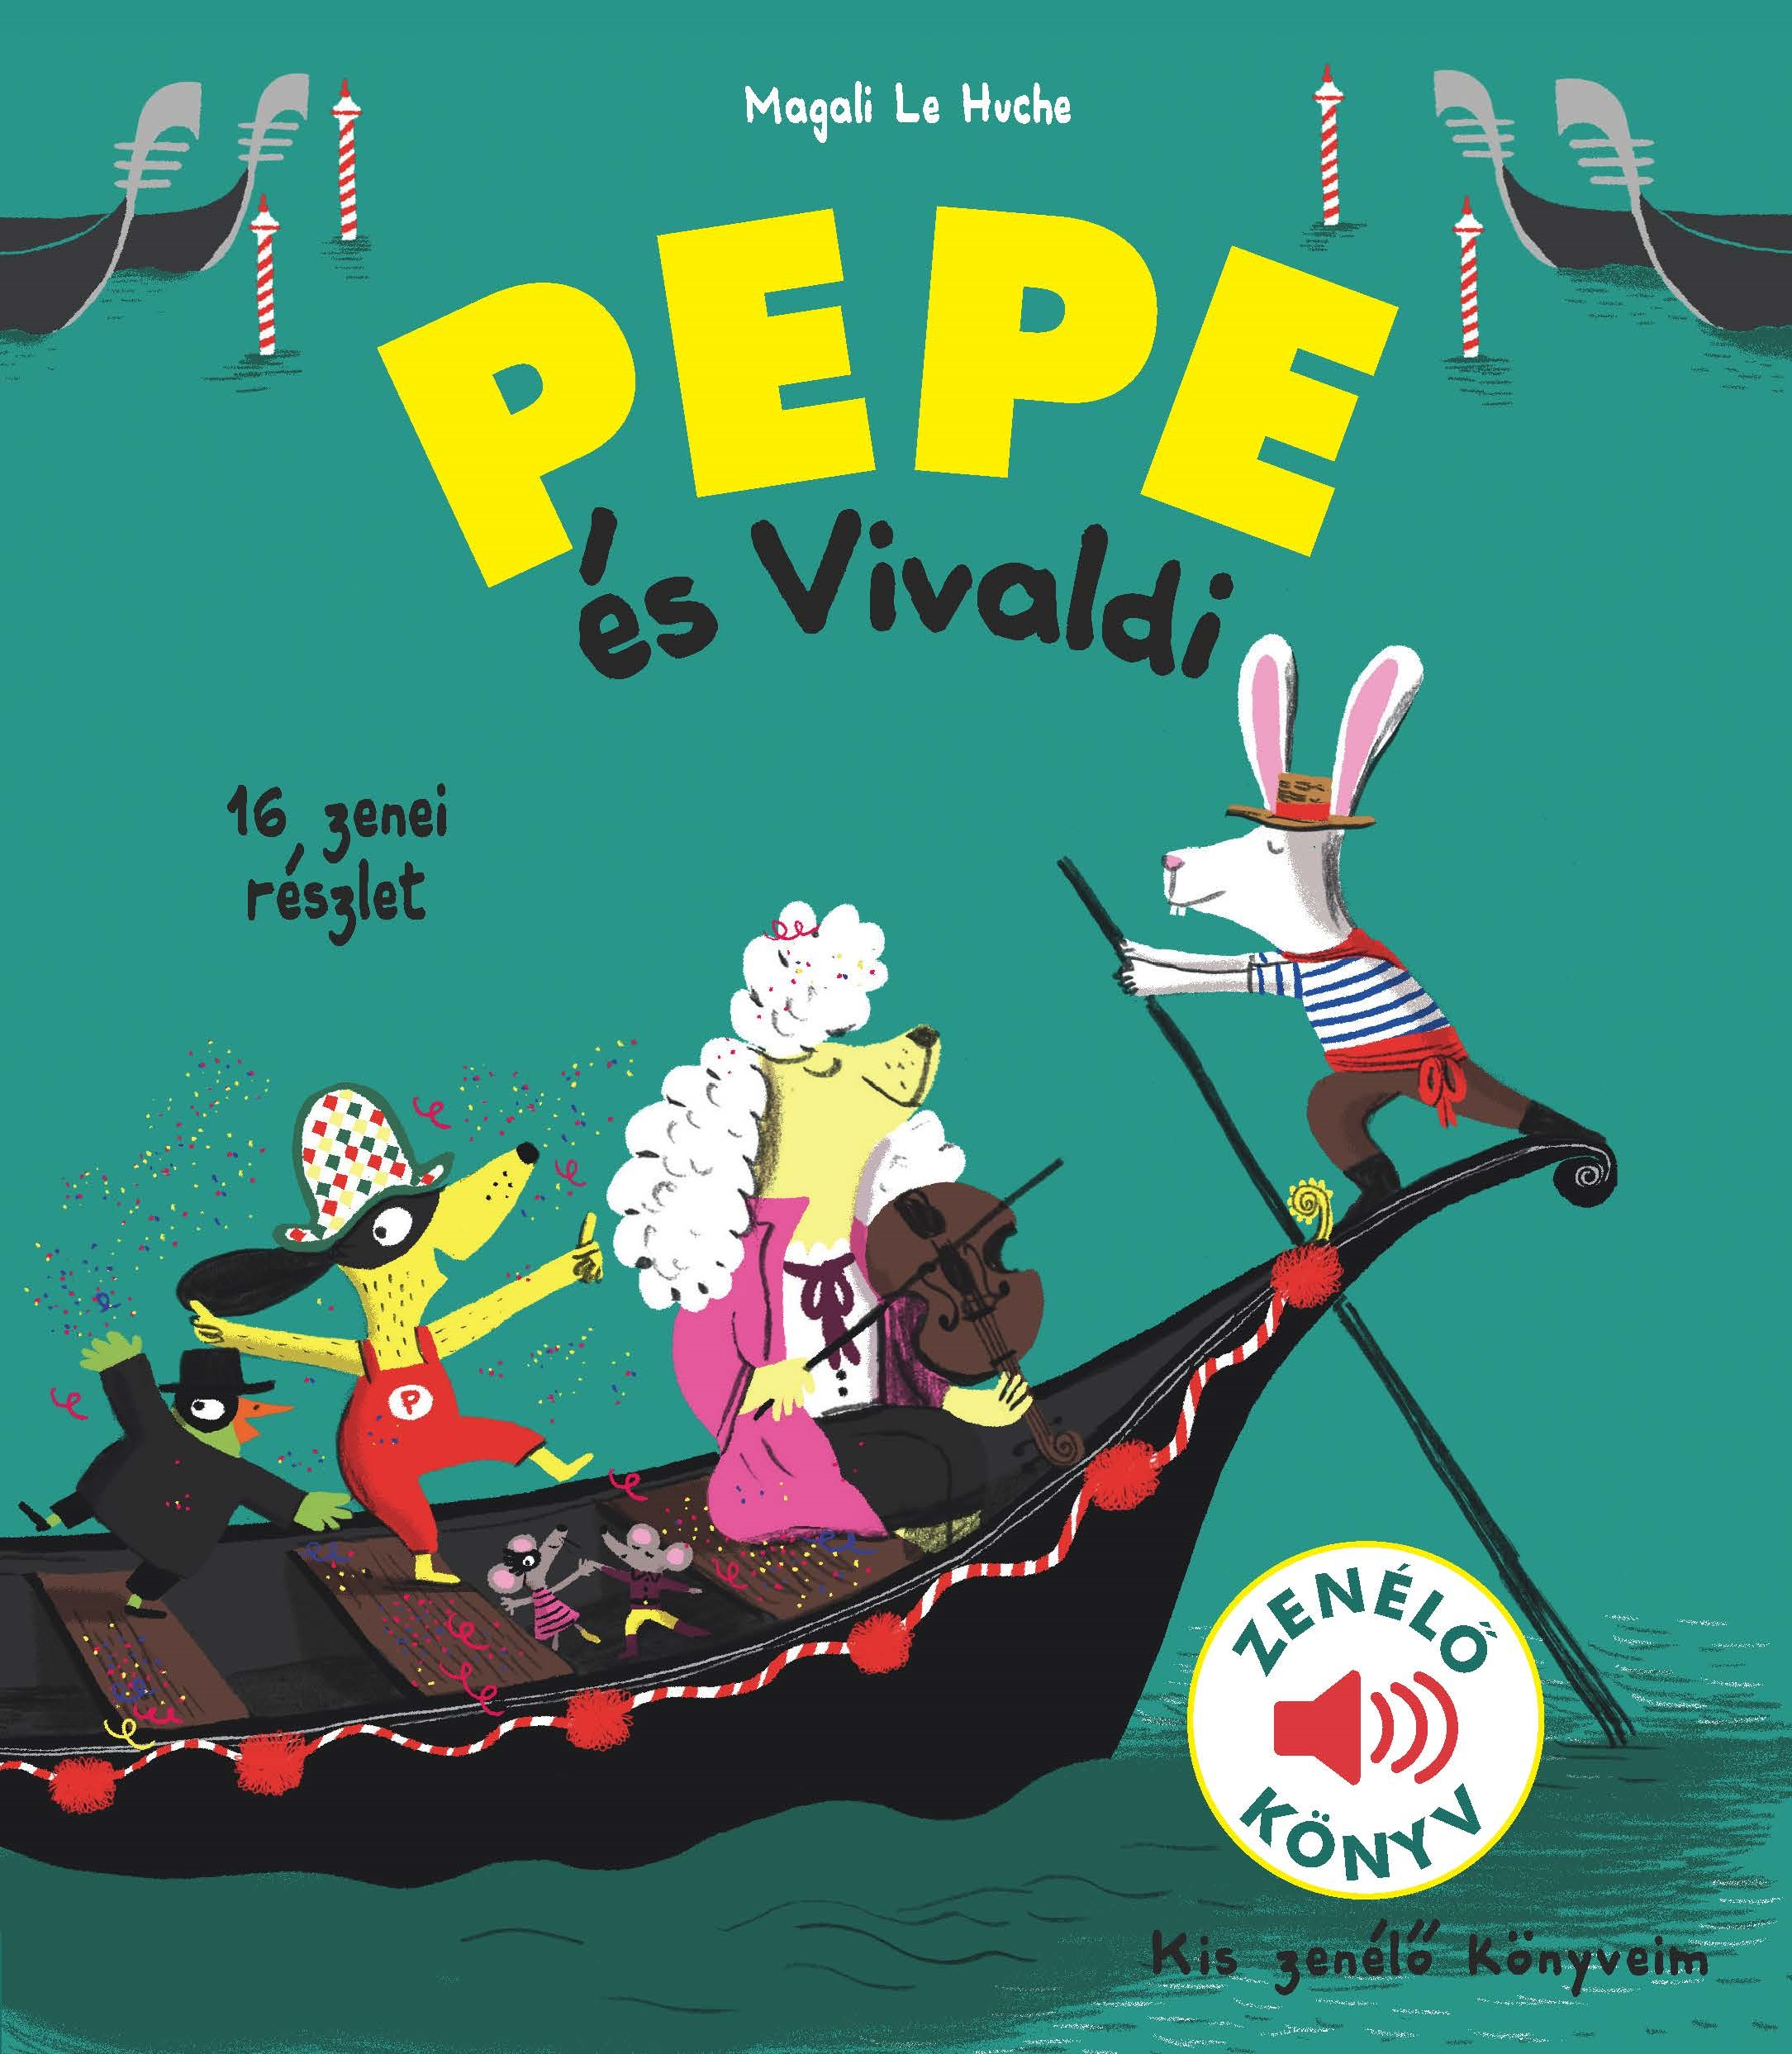 Magali Le Huche - Pepe és Vivaldi